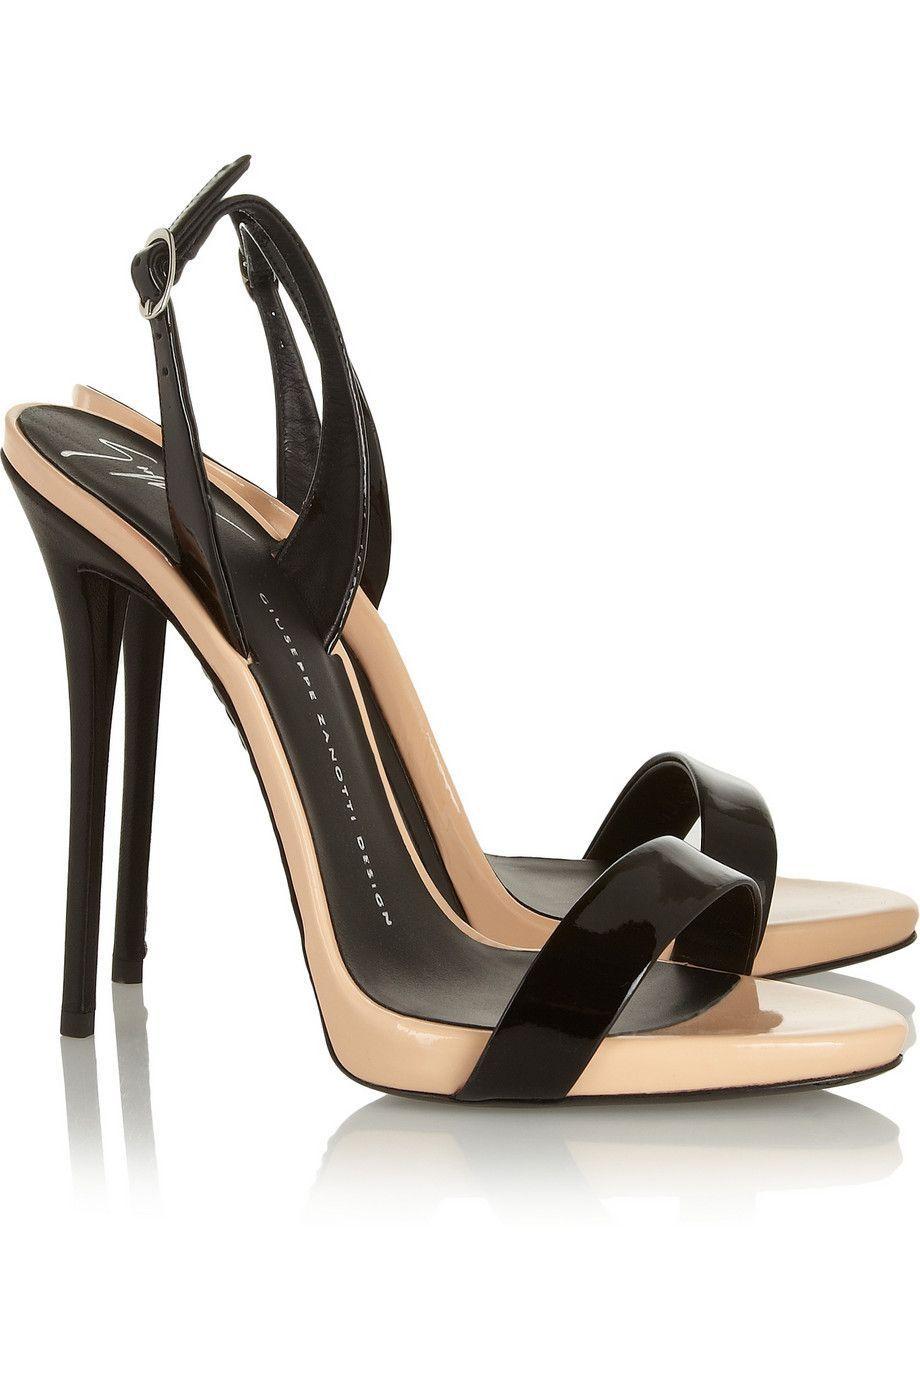 Coline Patent Leather SandalsGiuseppe Zanotti Su9zJsMT0